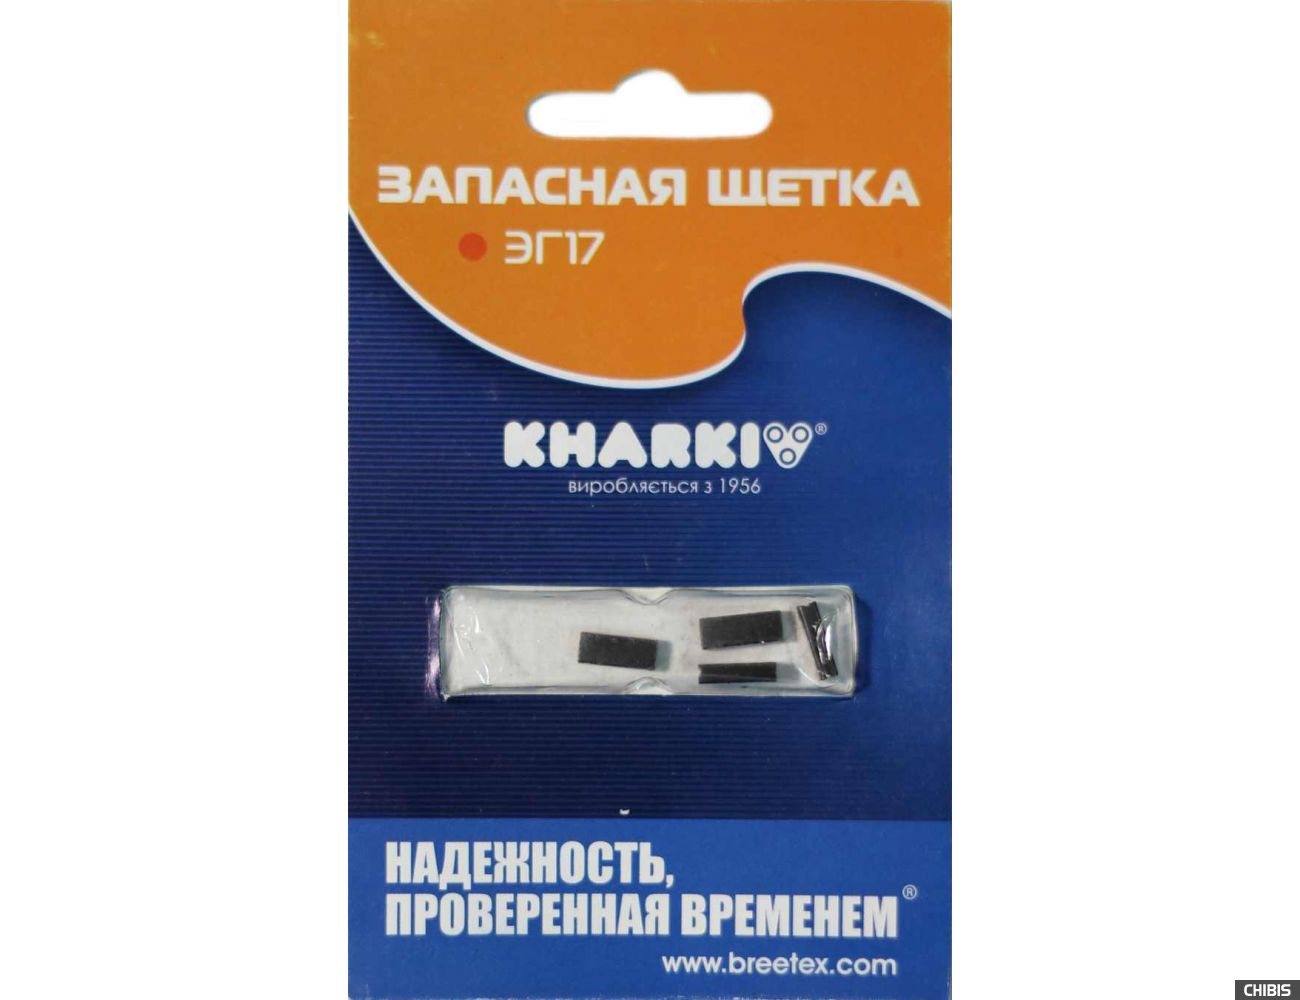 Щетки ЕГ17 для электробритв Харьков, Агидель, Бердск 4 шт блистер